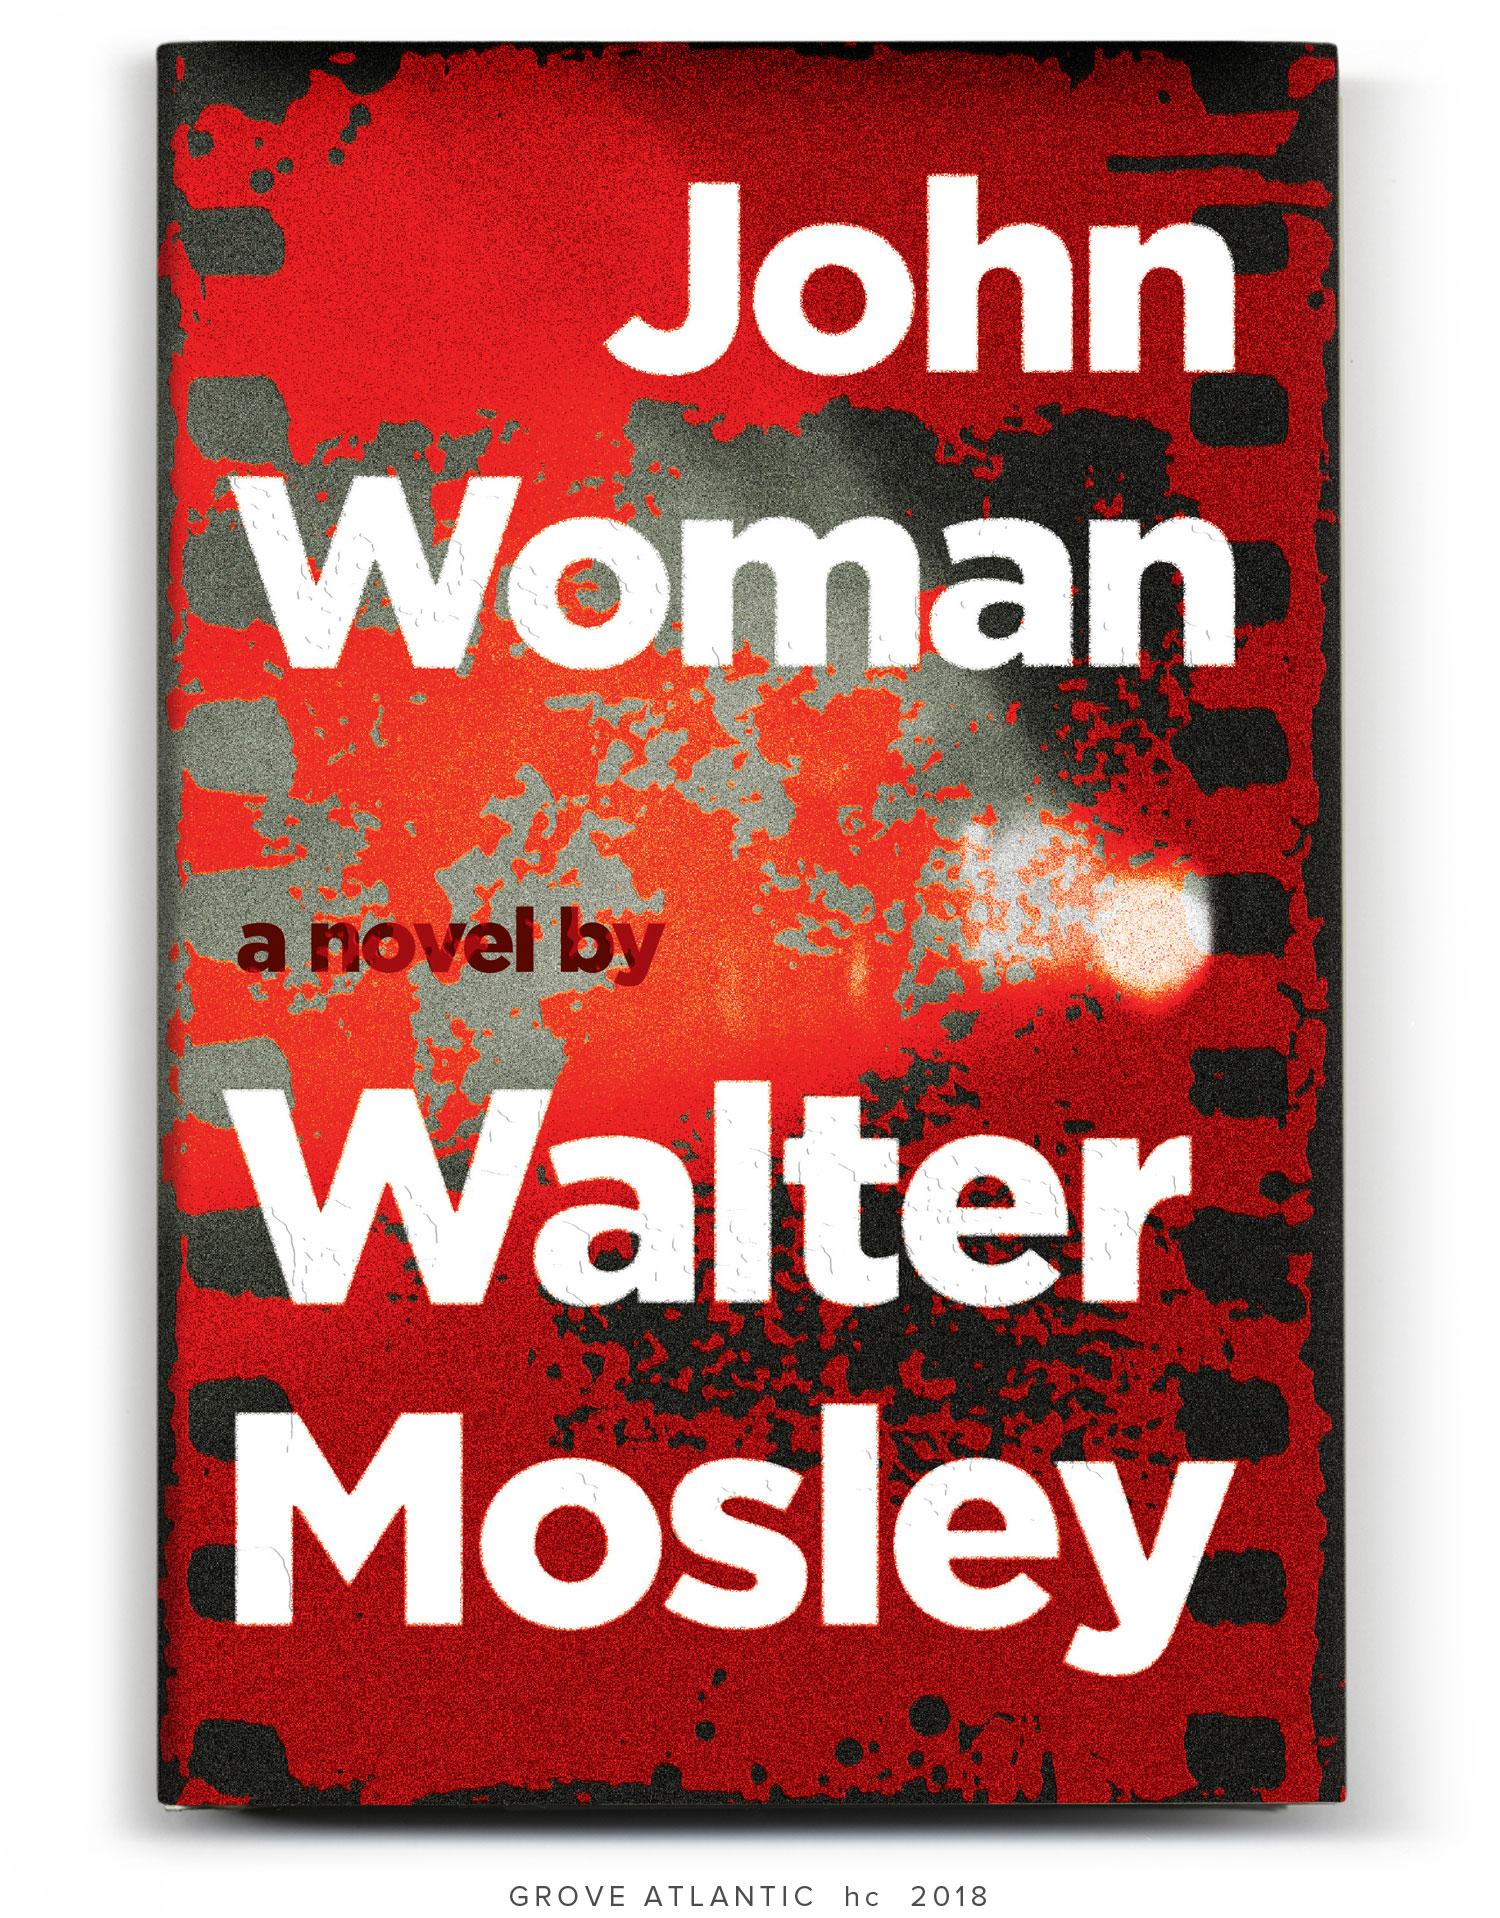 JOHN-WOMAN-hc-template-ss6v2.jpg